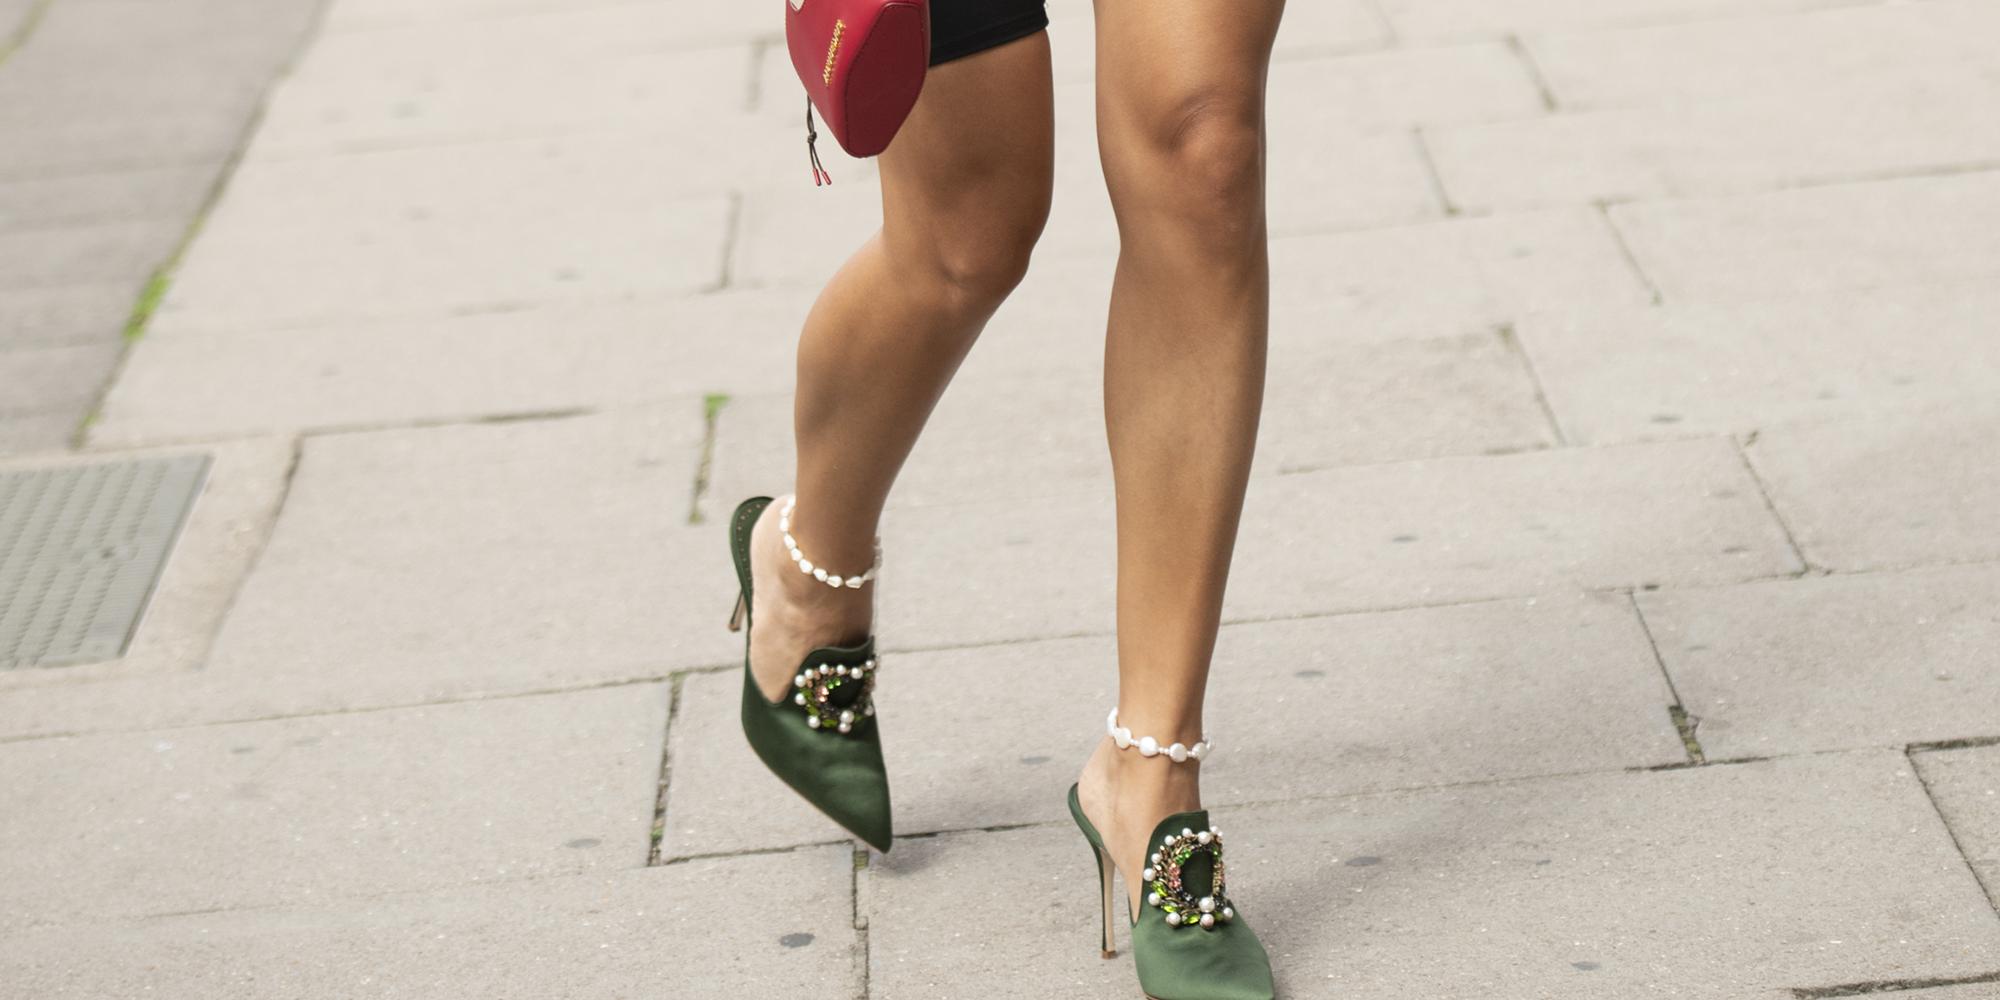 scarpe moda 2019 Manolo Blanhik tendenza